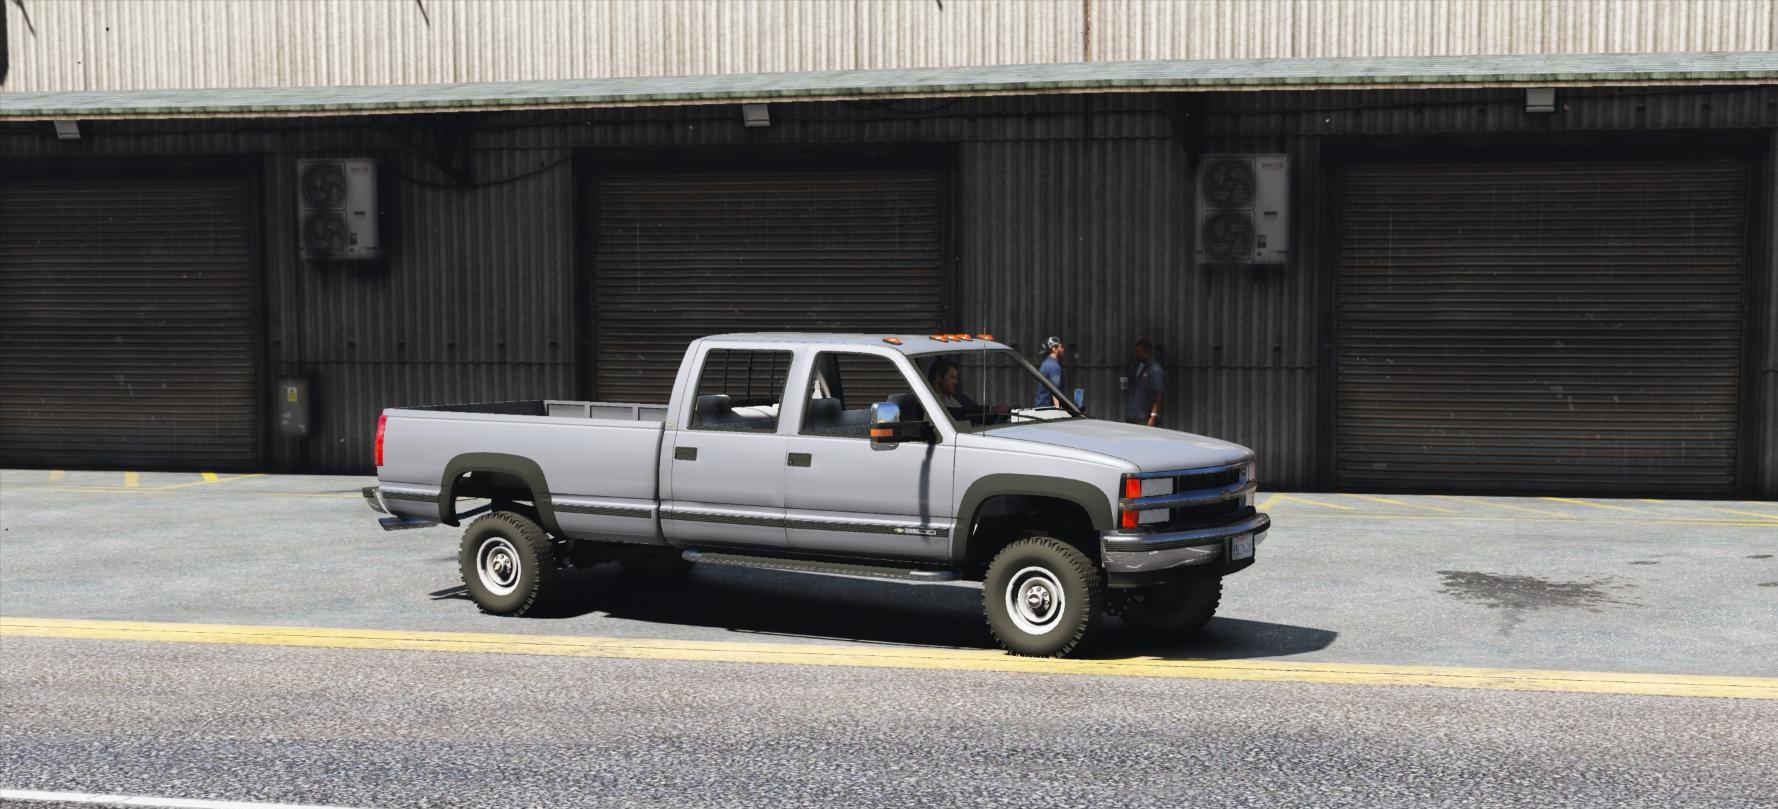 Silverado 99 chevrolet silverado : Chevrolet Silverado 3500 LS Crew Cab 4x4 1999 [Add-On   Replace ...